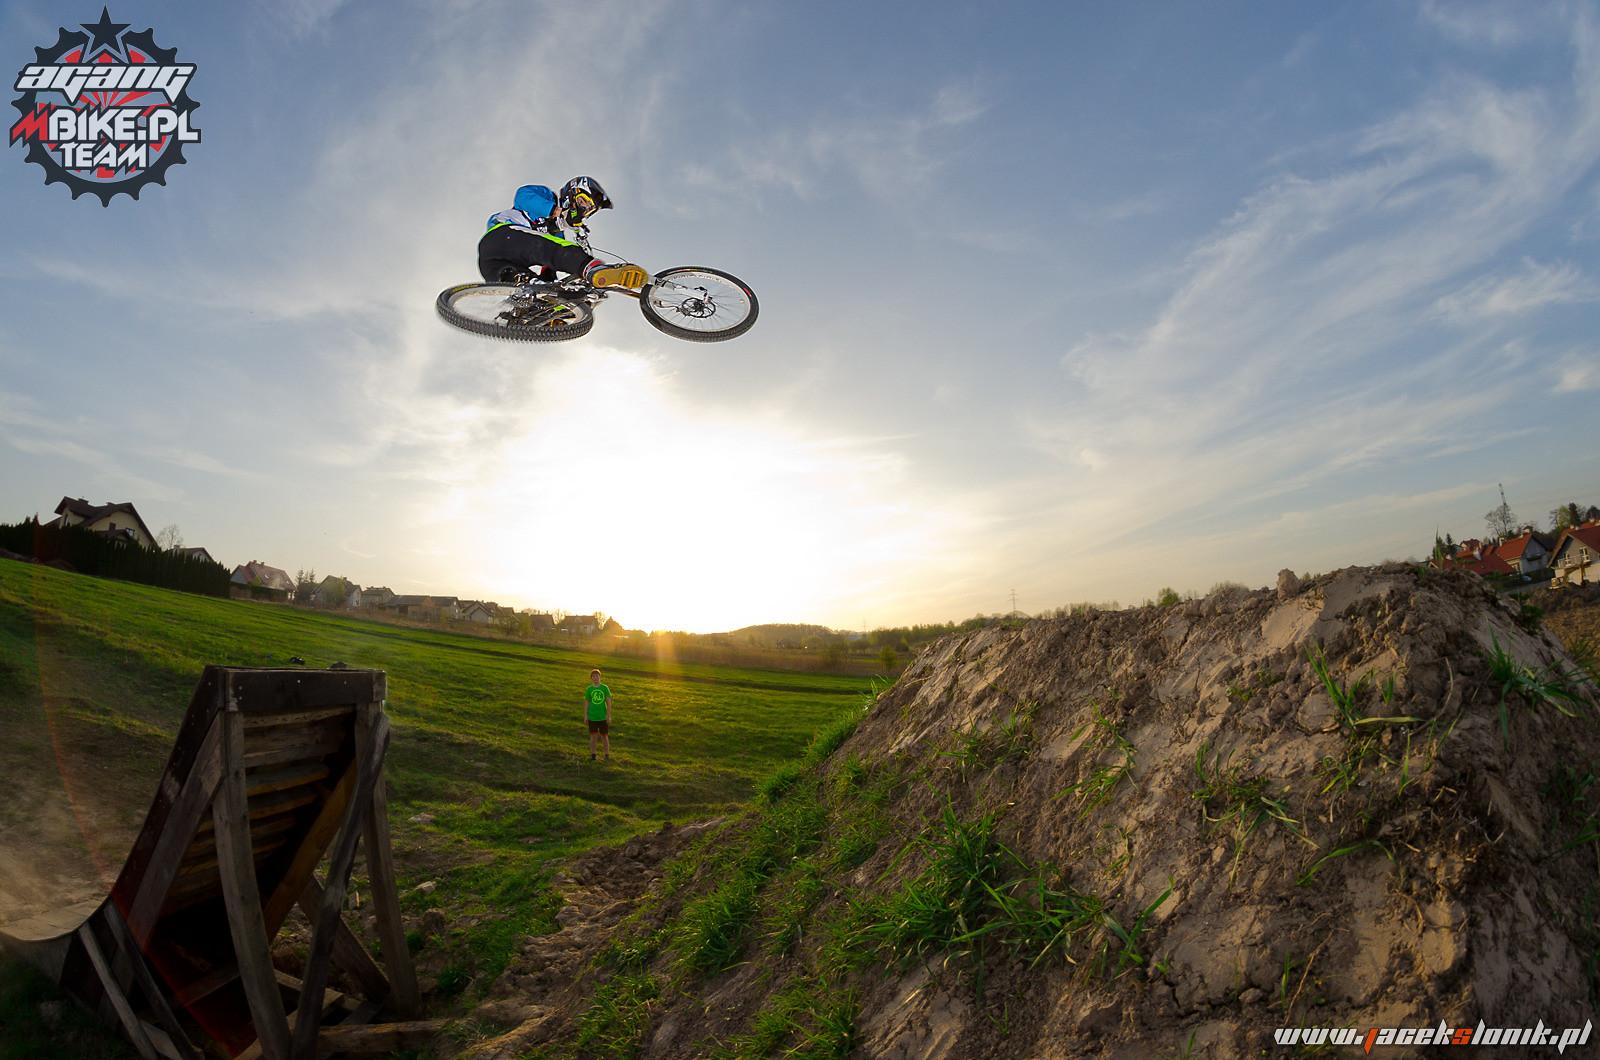 WHIP IT - Kawula - Mountain Biking Pictures - Vital MTB